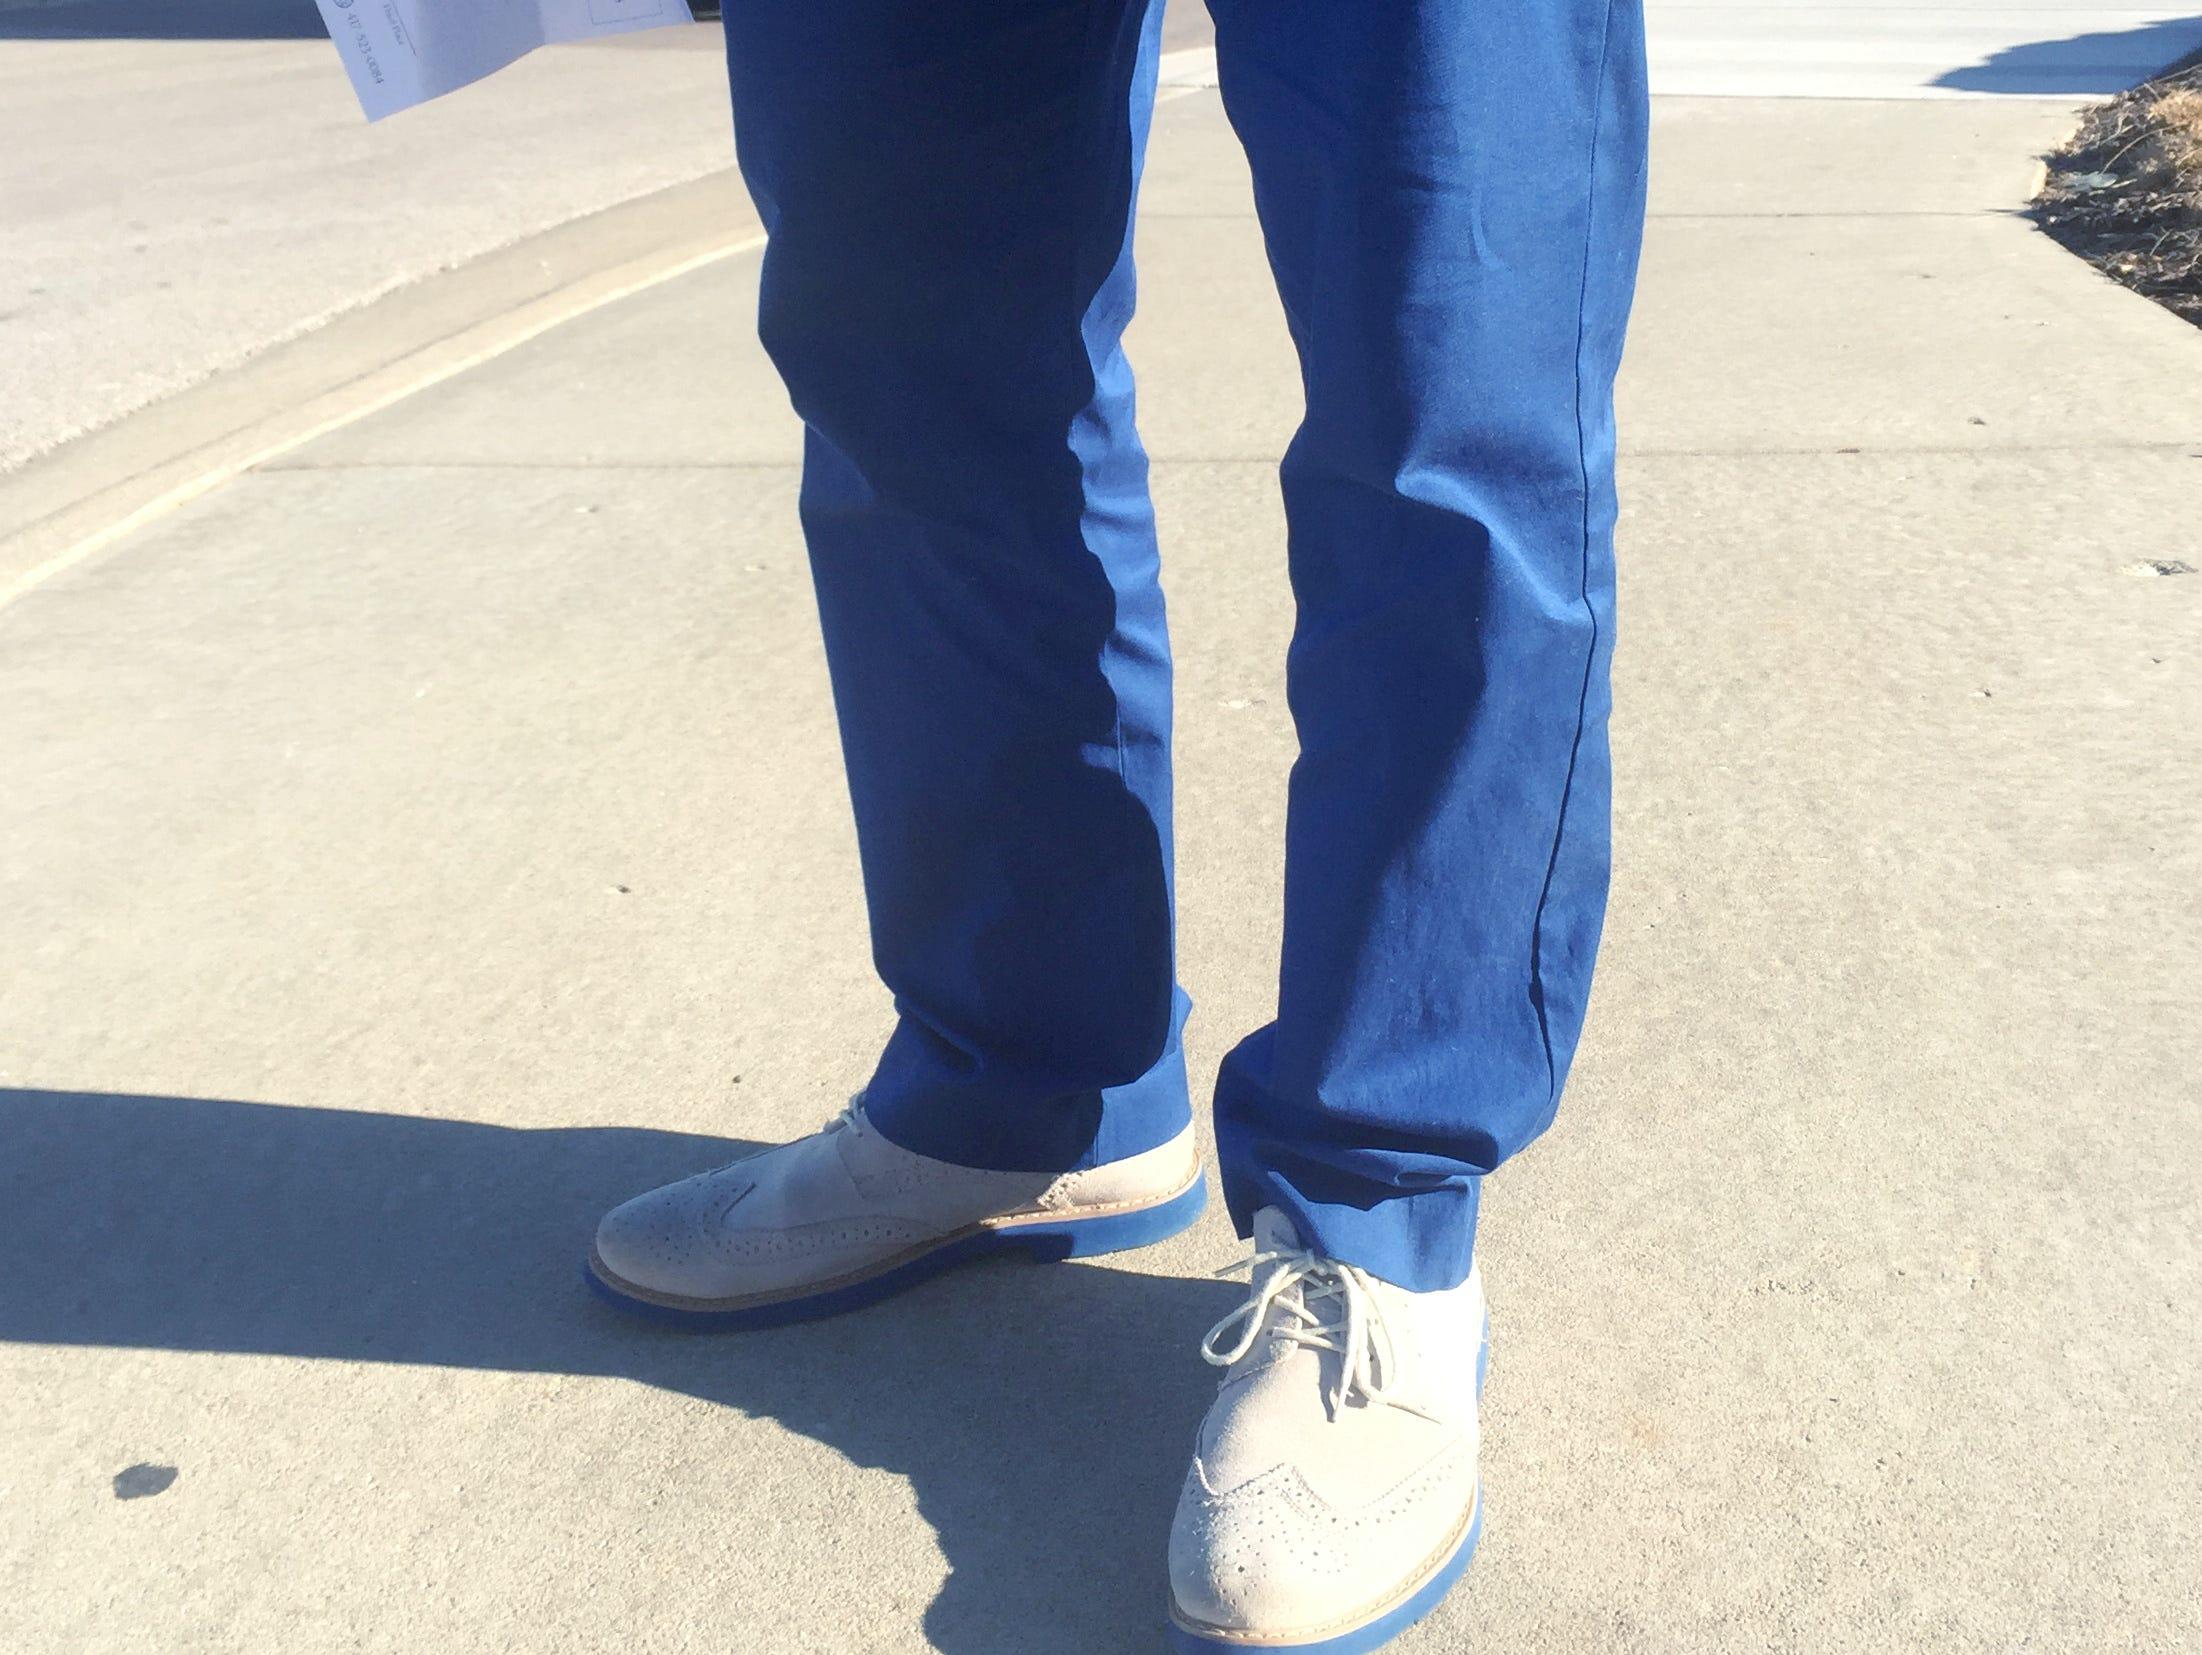 Bolivar boys basketball coach Robby Hoegh sometimes wears a pair of vivid blue slacks for the amusement of his team.